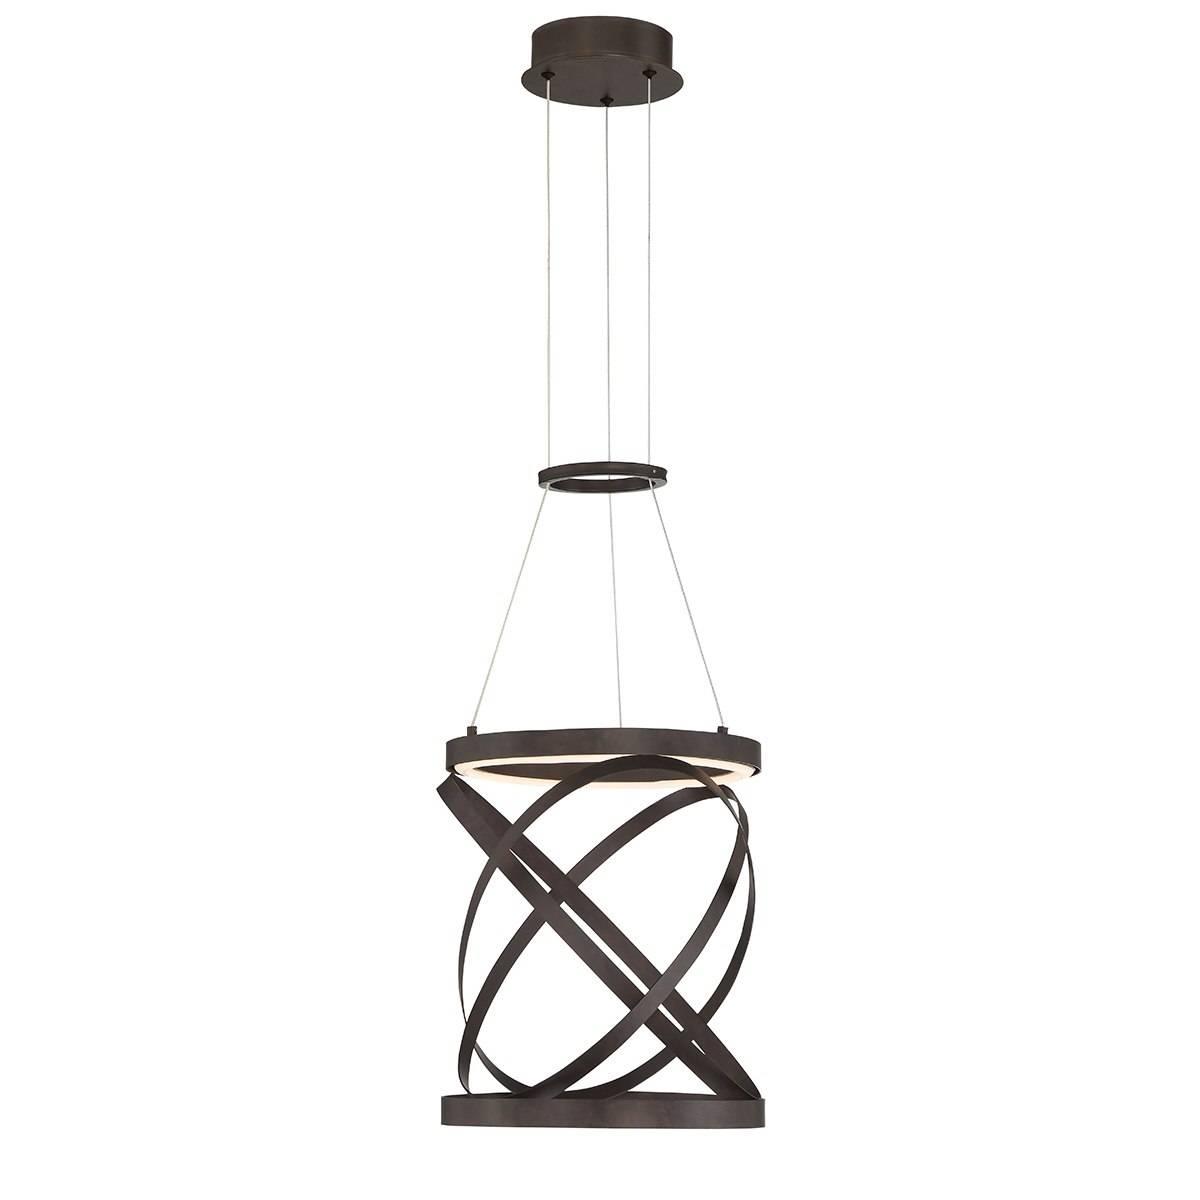 Eurofase - Pendants - Indoor Lighting